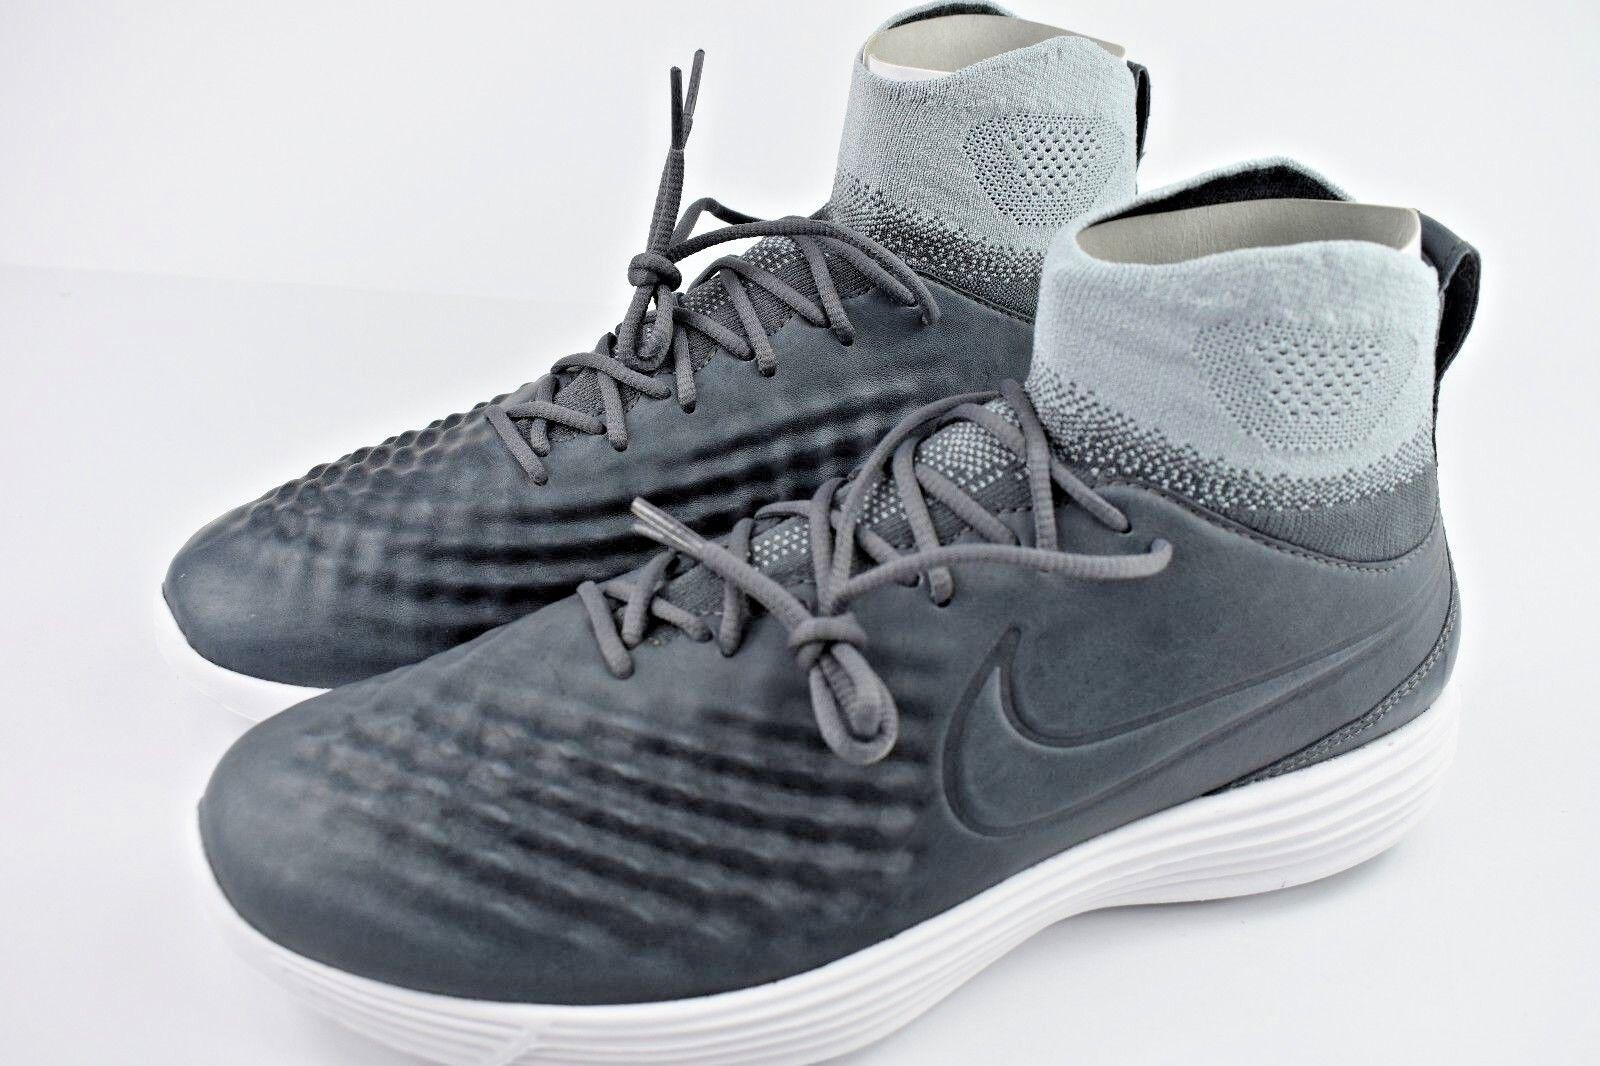 Nike Lunar Magista 2 II FK  Flyknit 852614 Mens Indoor Soccer Shoes 852614 Flyknit 002 Grey 304316